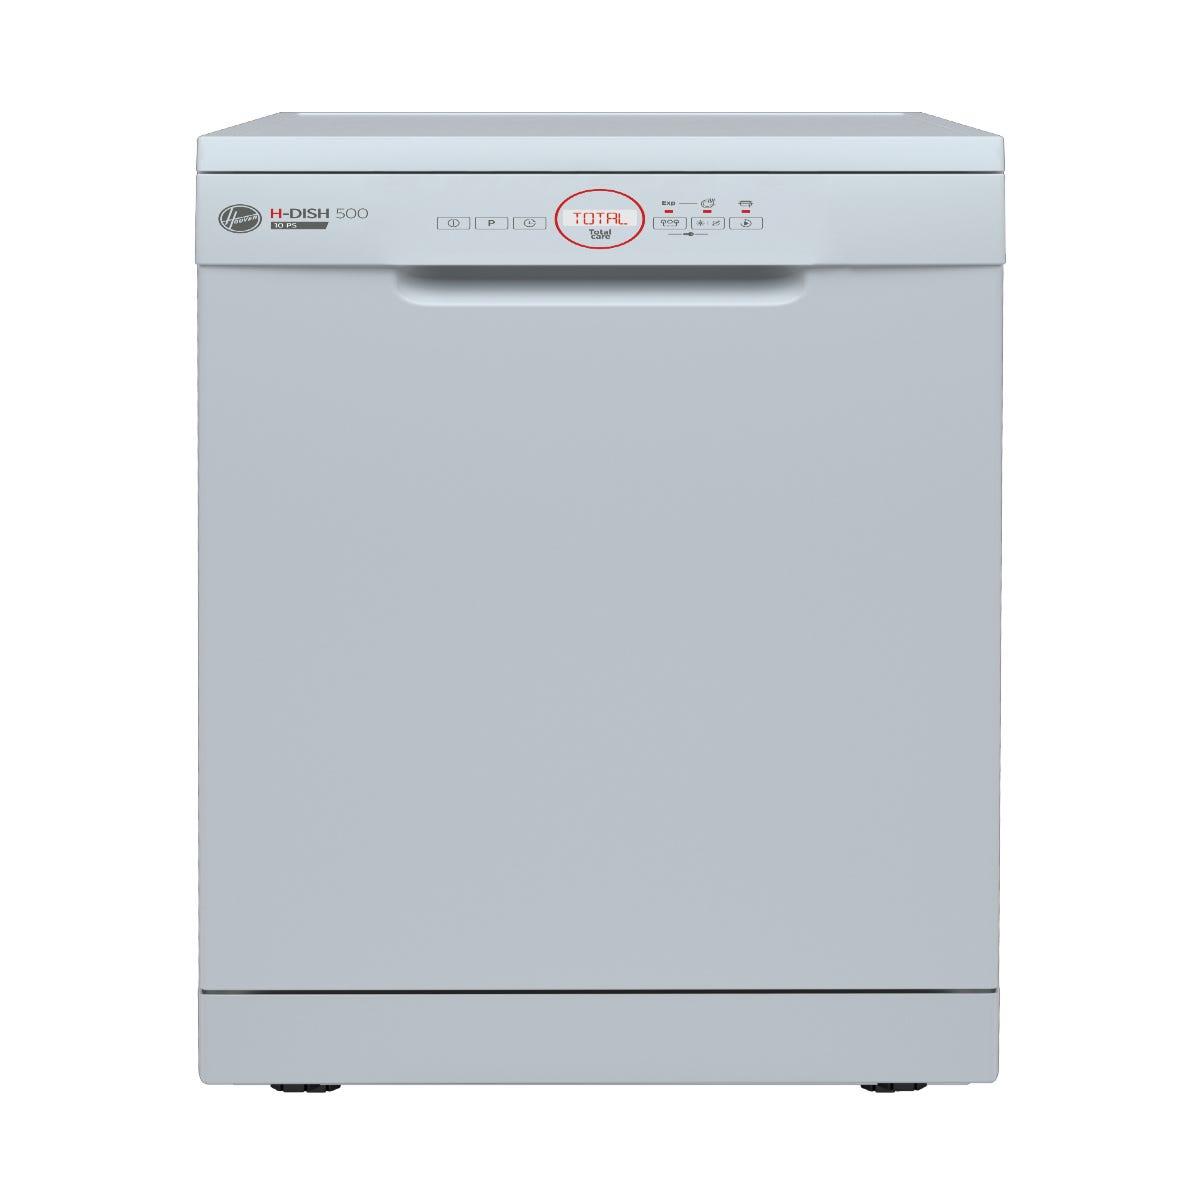 Hoover HDPH 2D1049W 10 Place Slimline Dishwasher - White